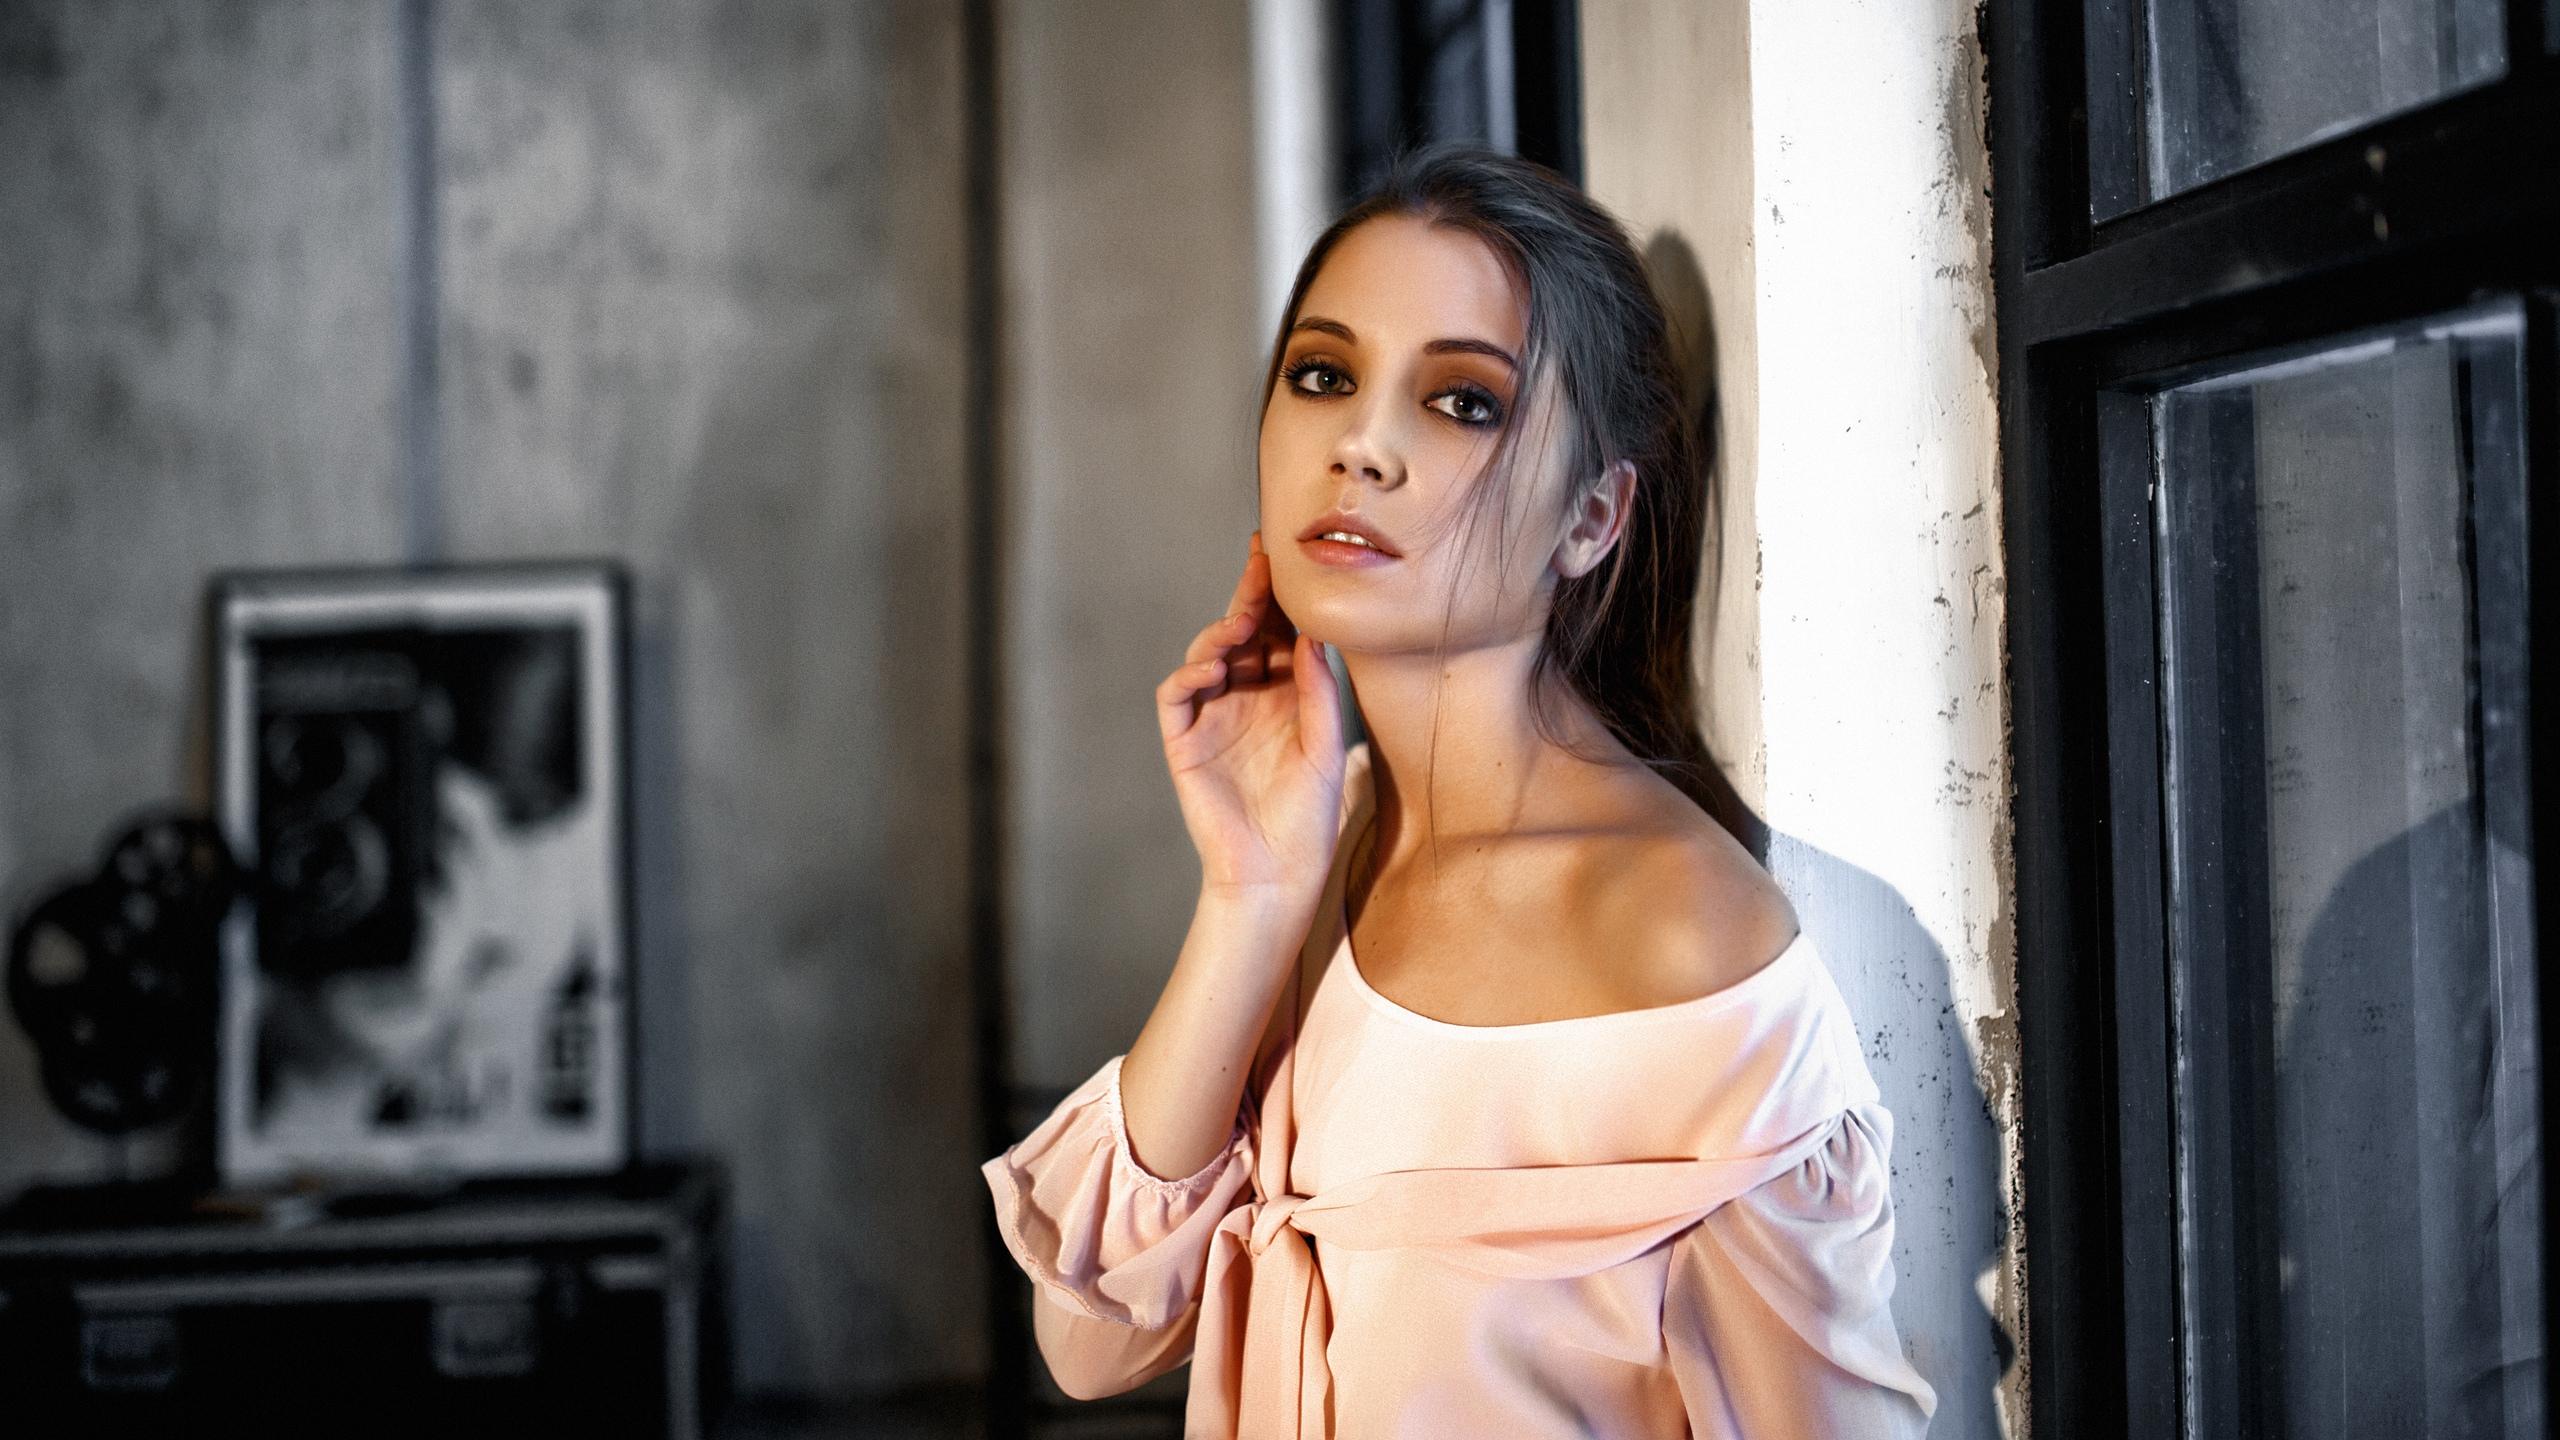 Alexey Kishechkin Women Ksenia Kokoreva Brunette Looking At Viewer Makeup Pink Clothing Eyeshadow In 2560x1440